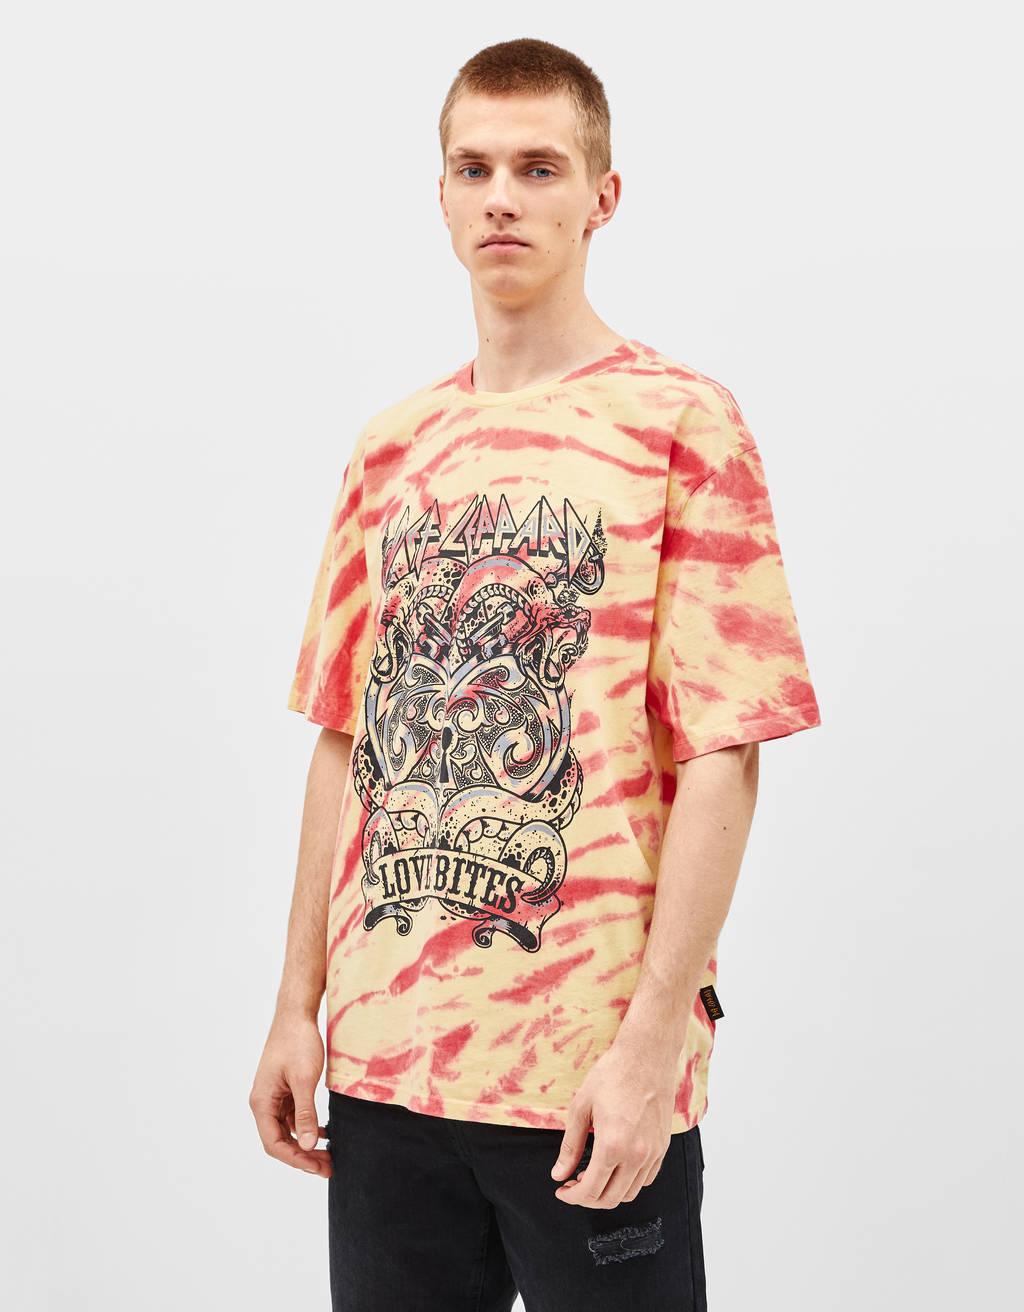 'Def Leppard' tie-dye T-shirt